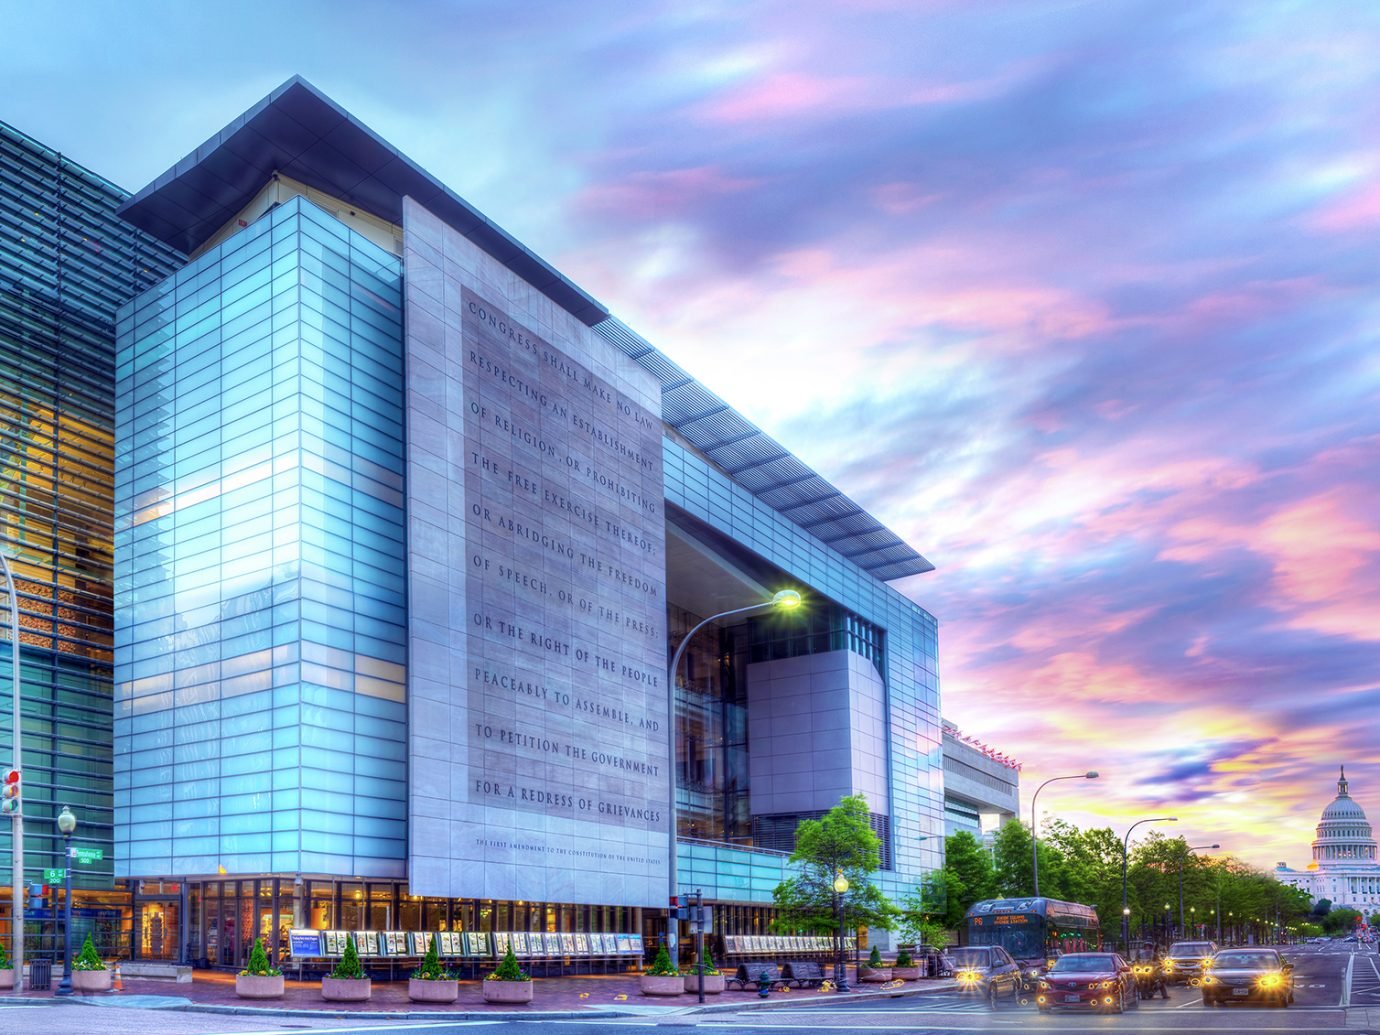 Newseum exterior, Washington DC